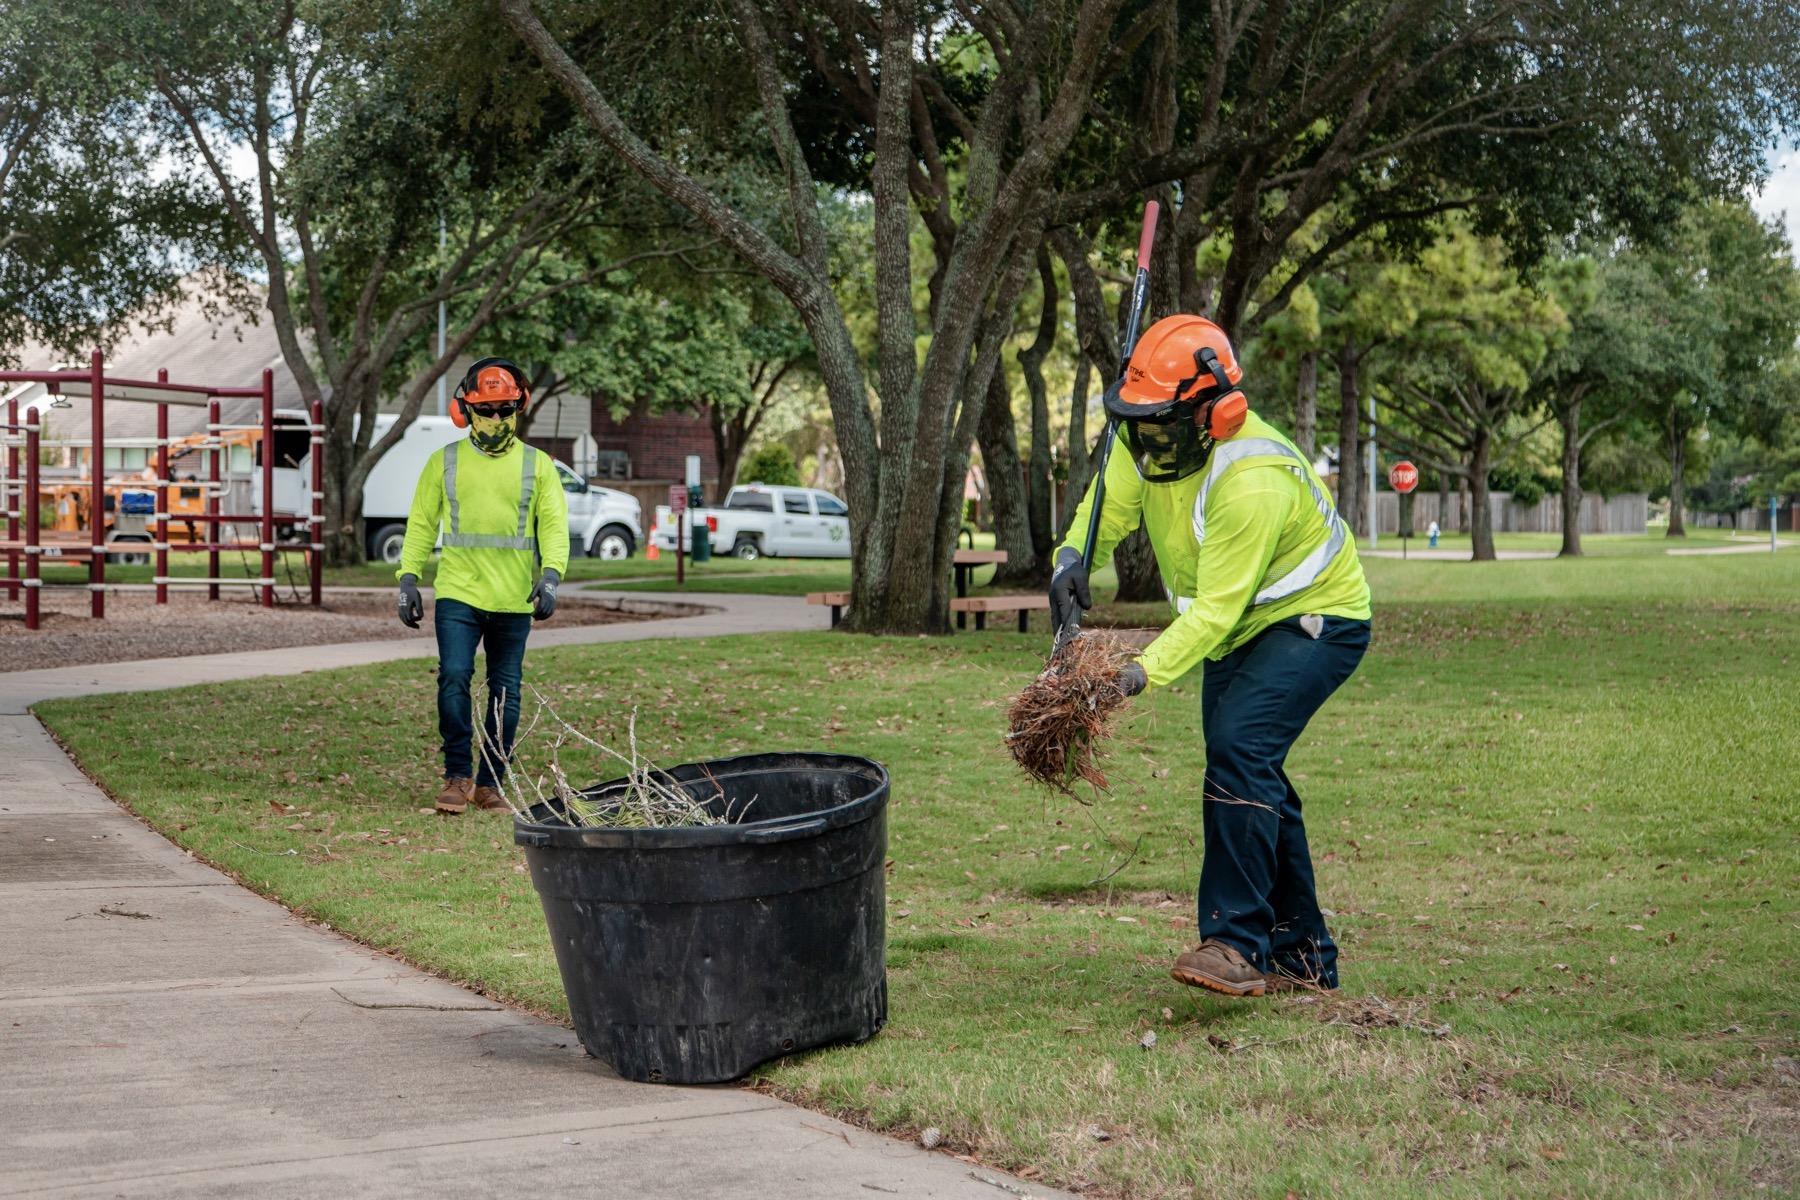 Maintenance crews cleaning up leaf and tree debris